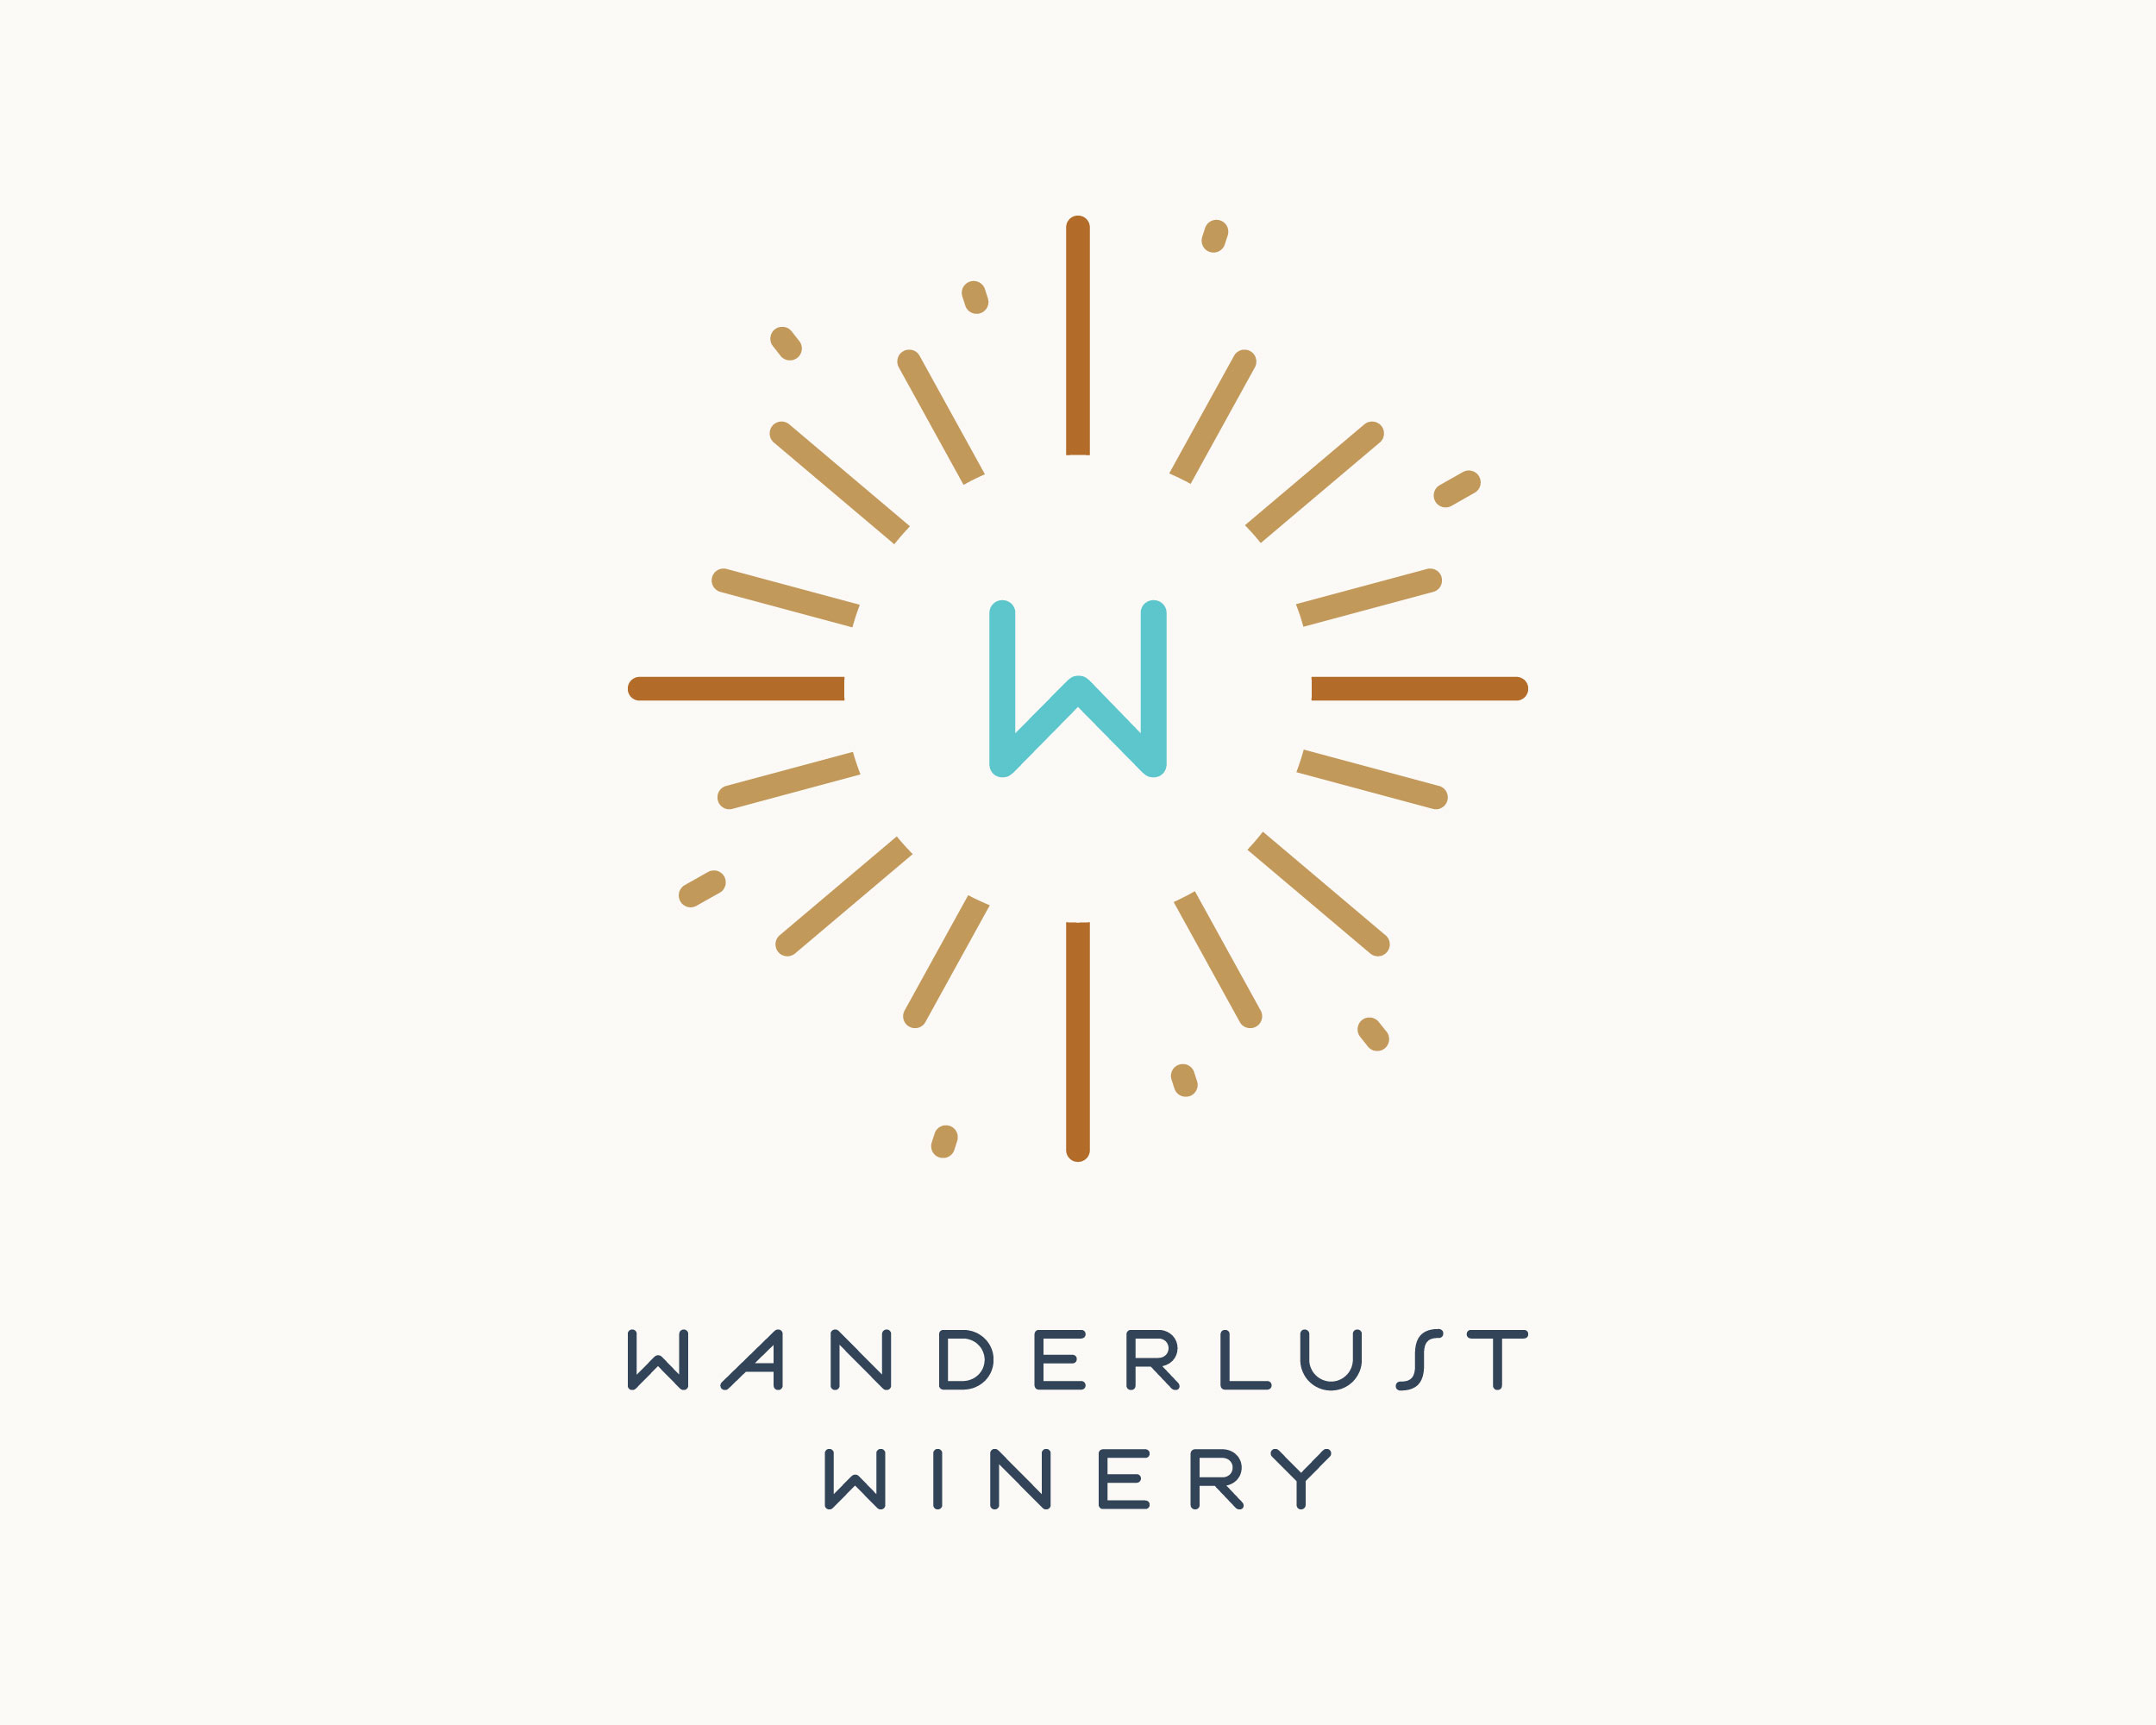 wanderlust-winery.jpg